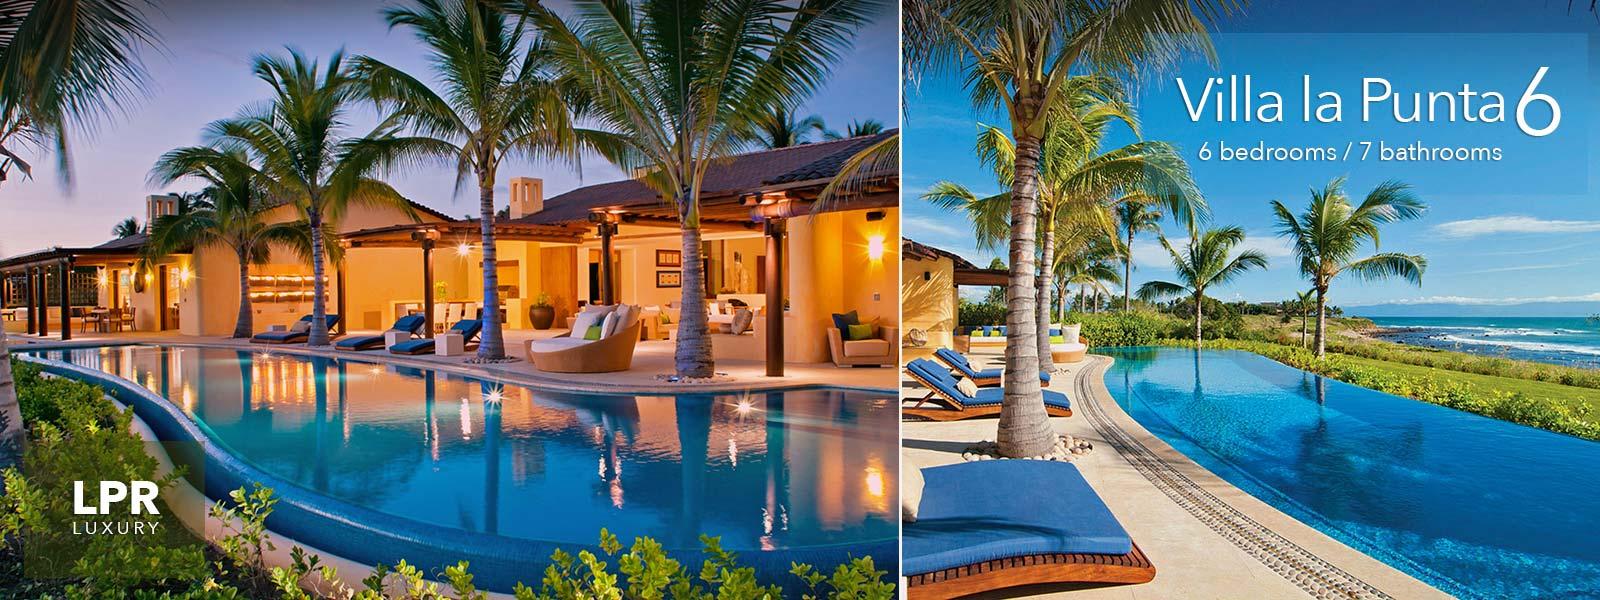 Villa la Punta 6- La Punta Estate - Punta Mita Resort - Riviera Nayarit - Mexico